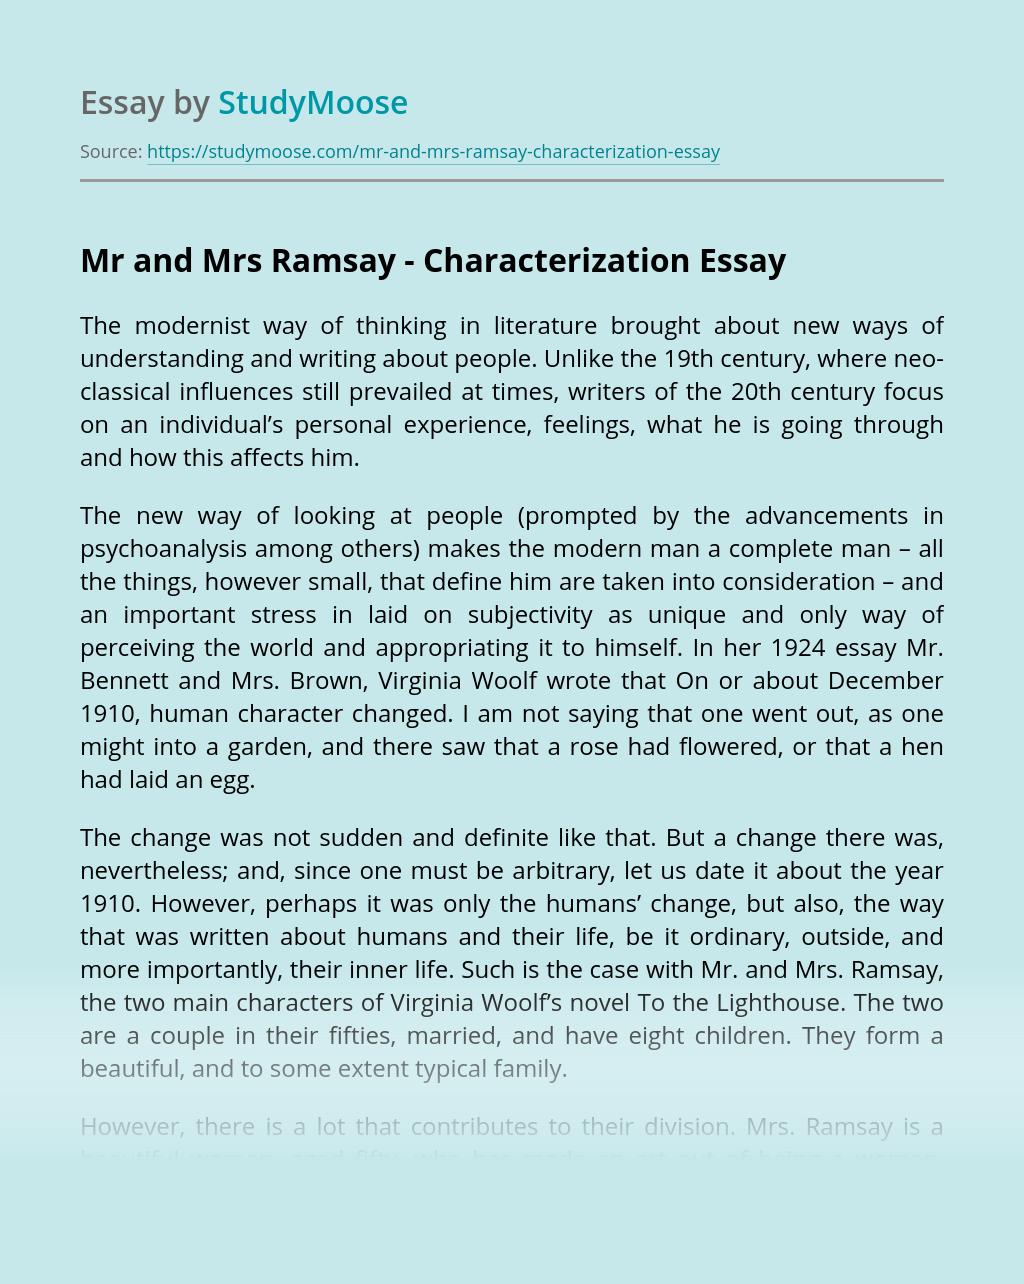 Mr and Mrs Ramsay - Characterization